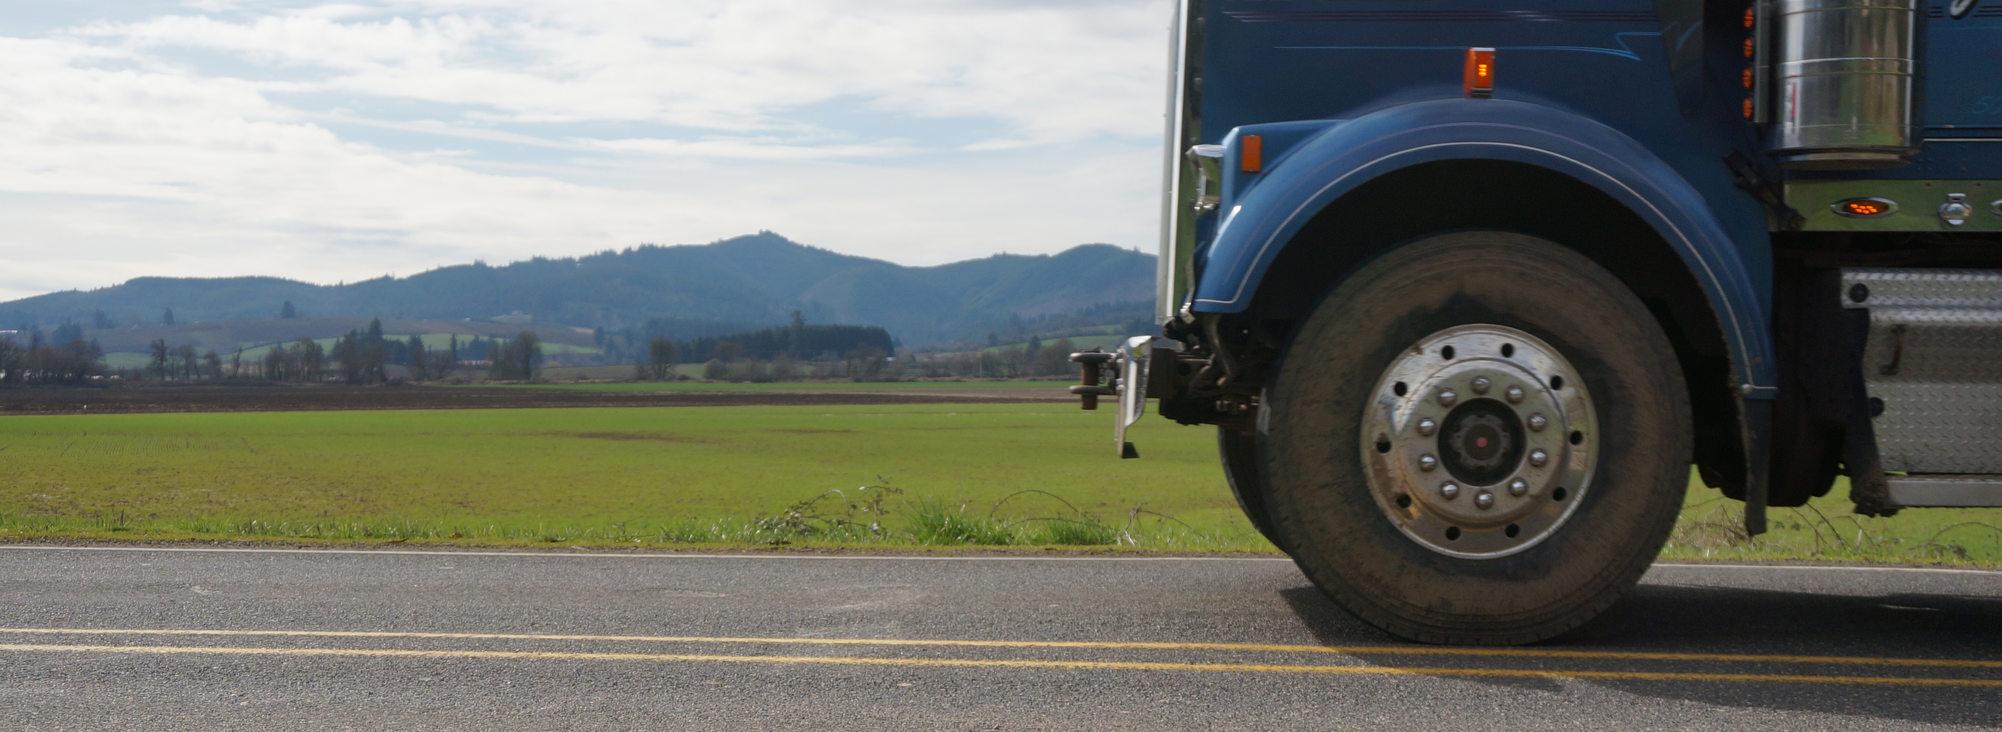 Wide shot of a freight truck wheel